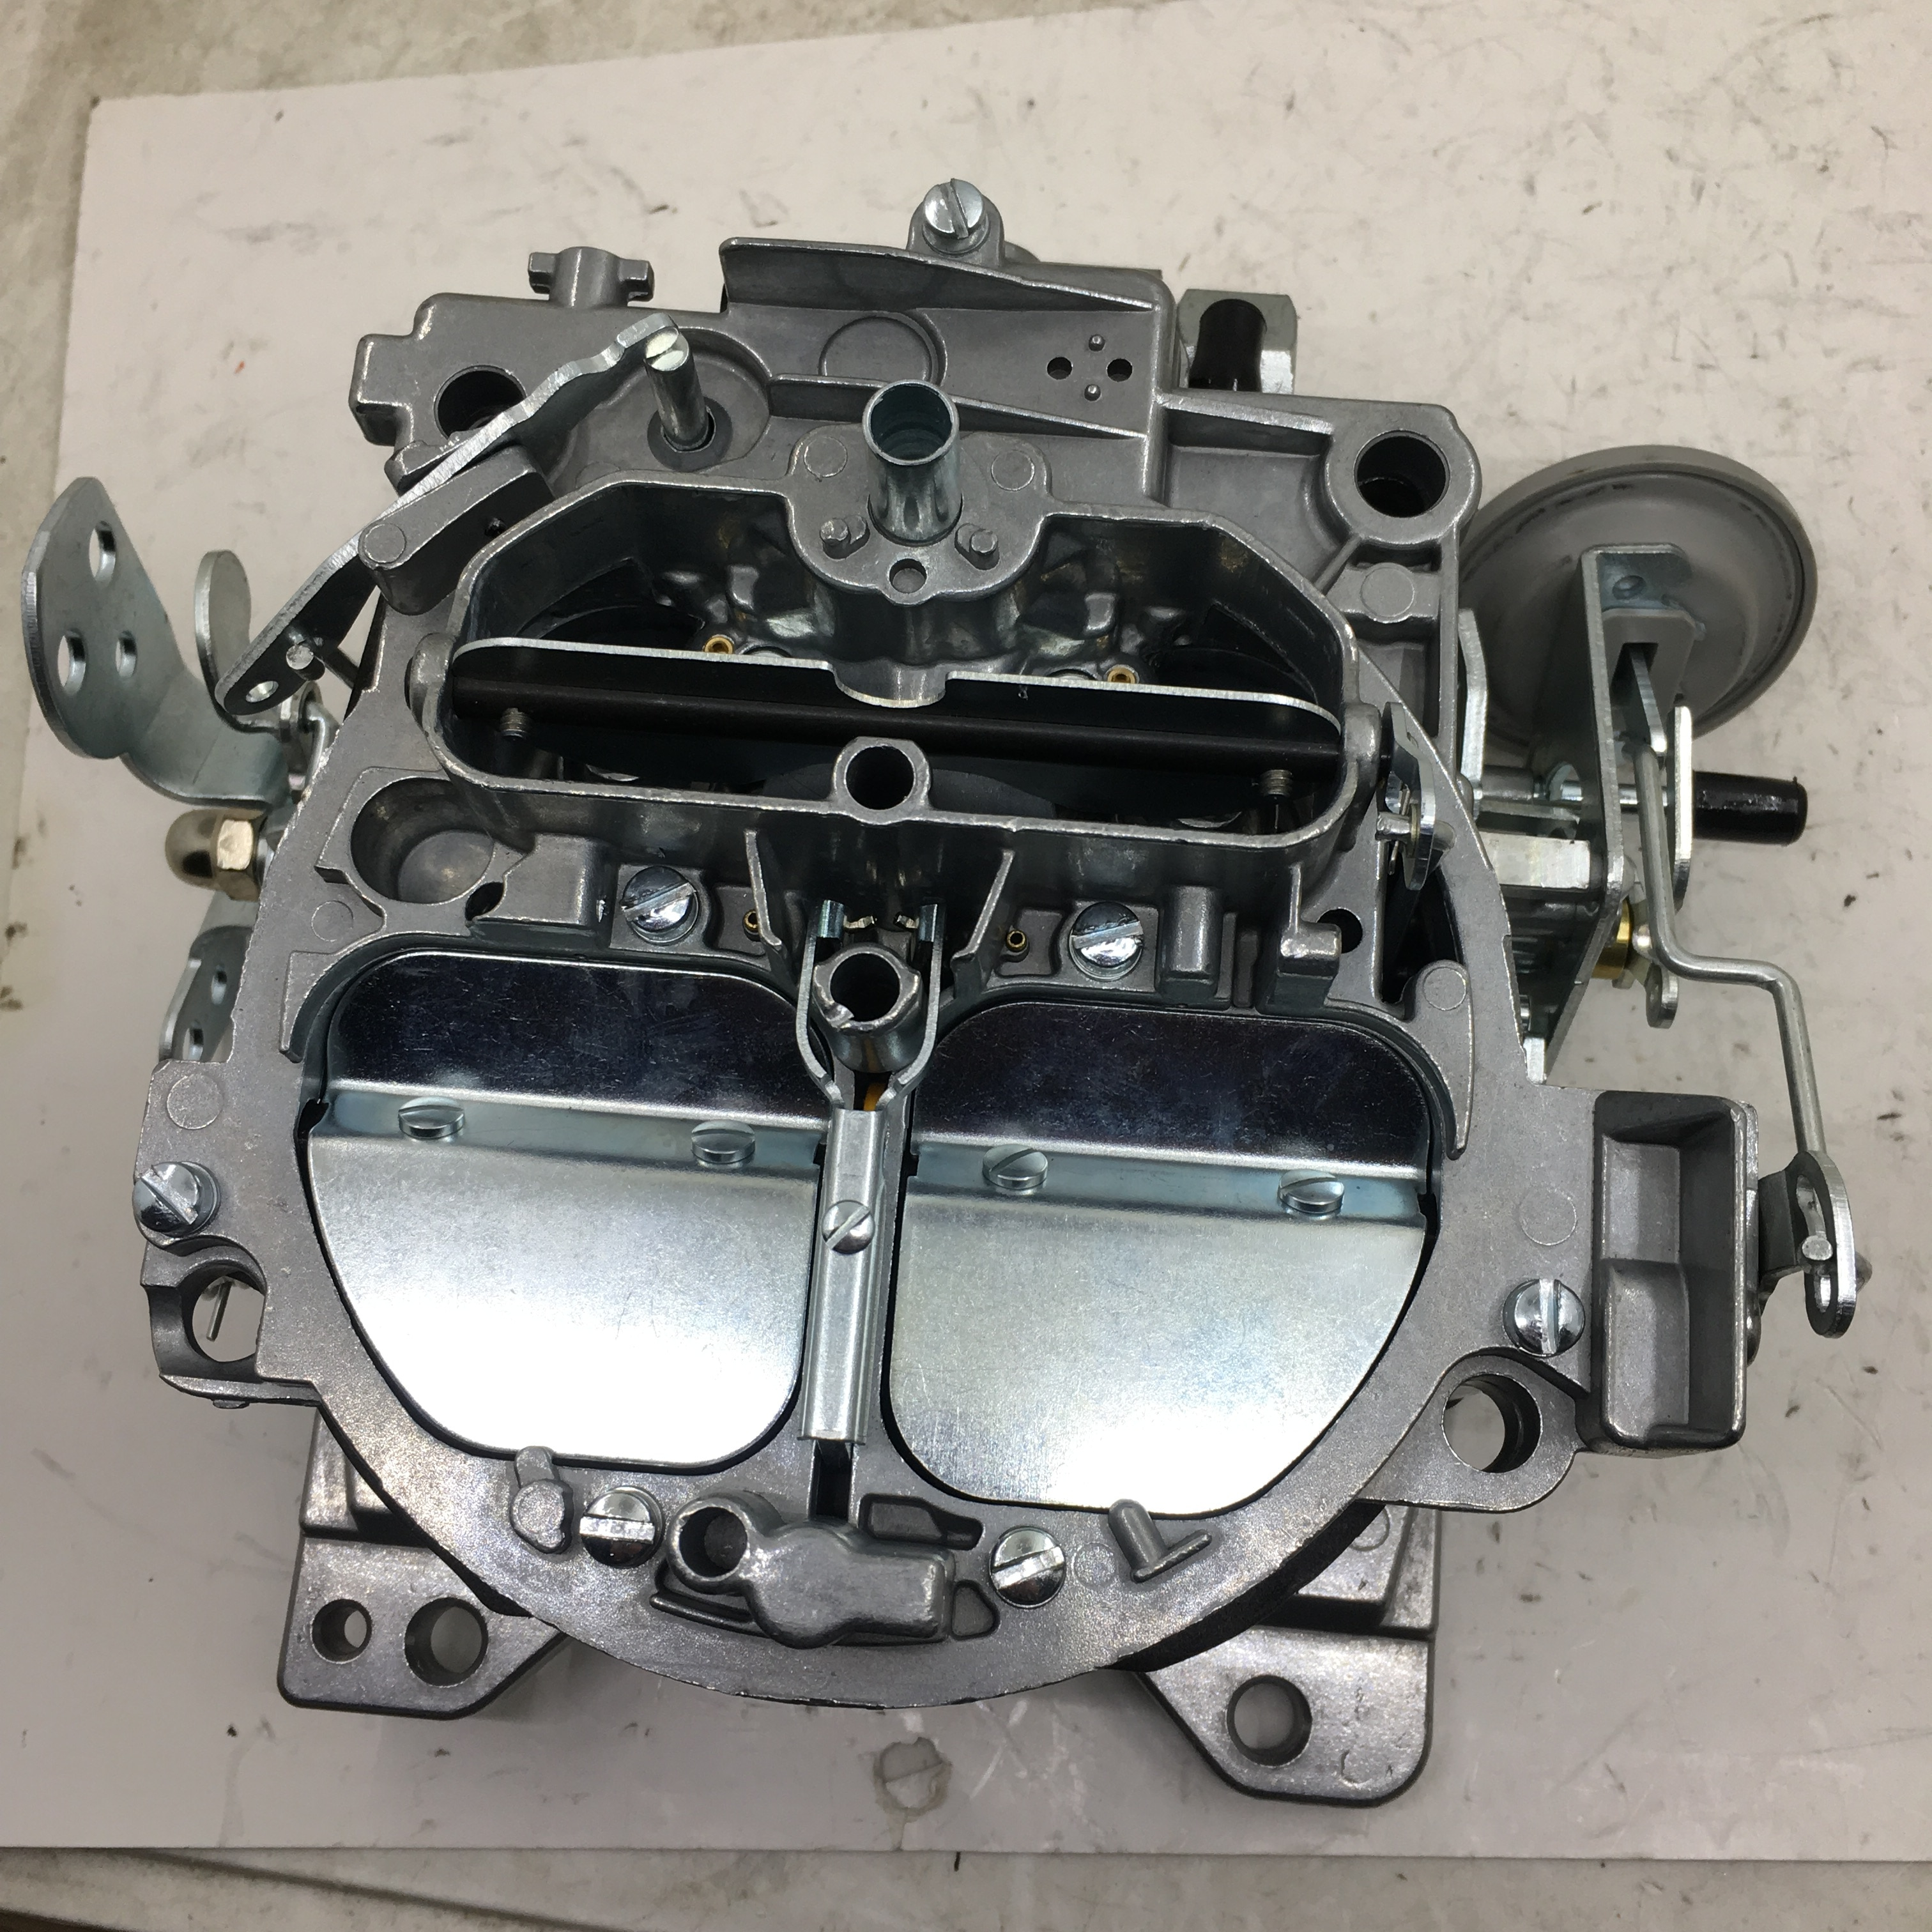 Carburador carb novo de sherryberg apto para chrysler 1985 - 1990 318ci 5.2l v8 e4me 4bbl rochester carburador 17085433